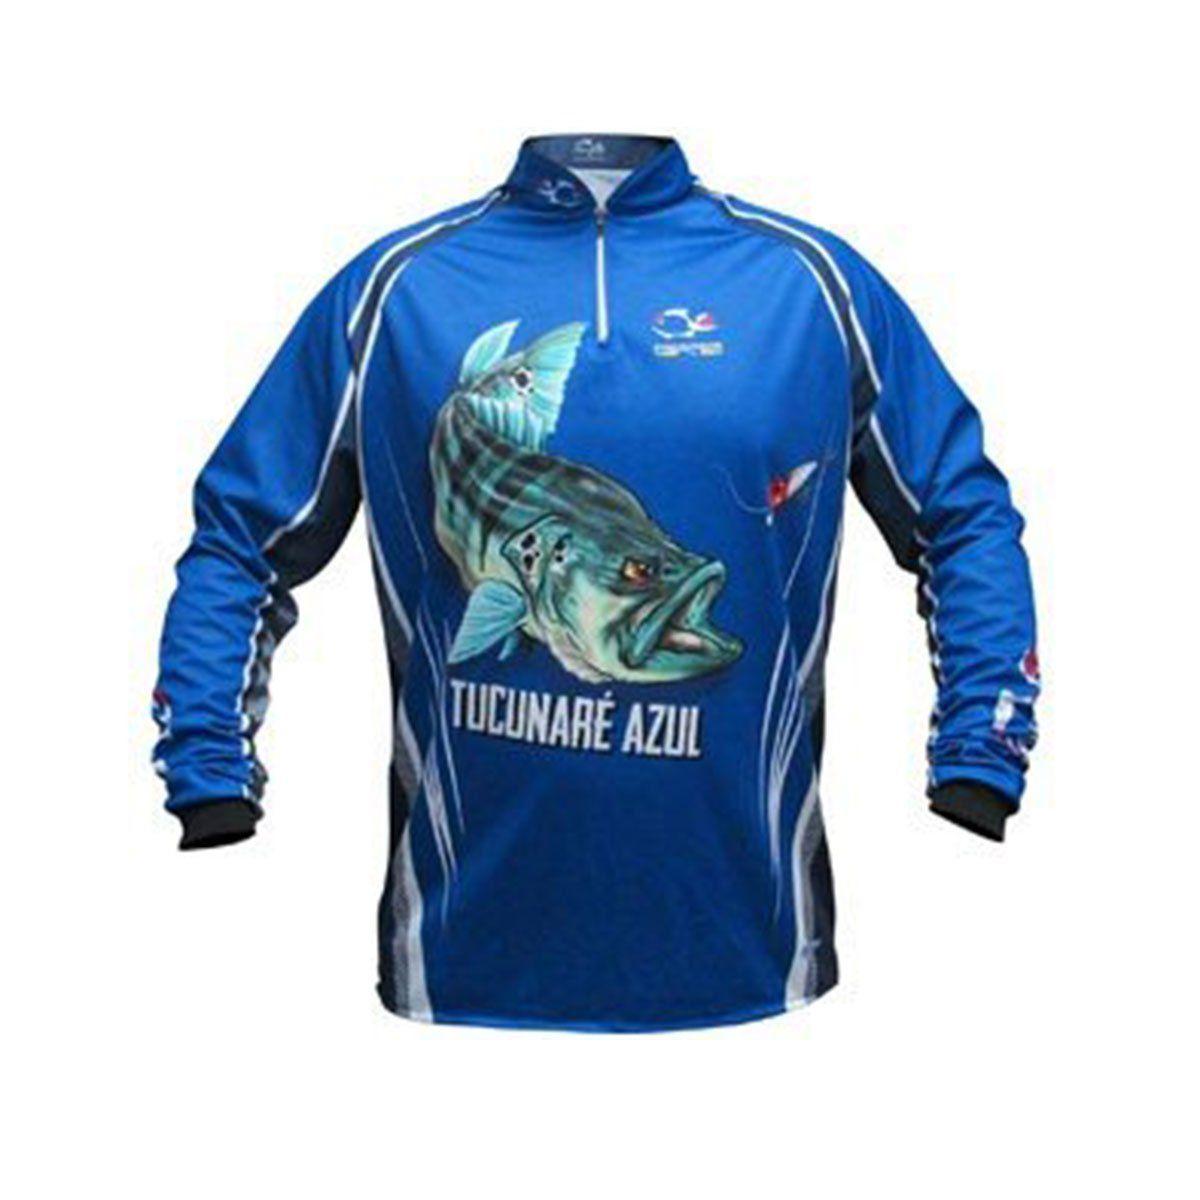 Camisa Faca na Rede Tucunare Azul NC 21